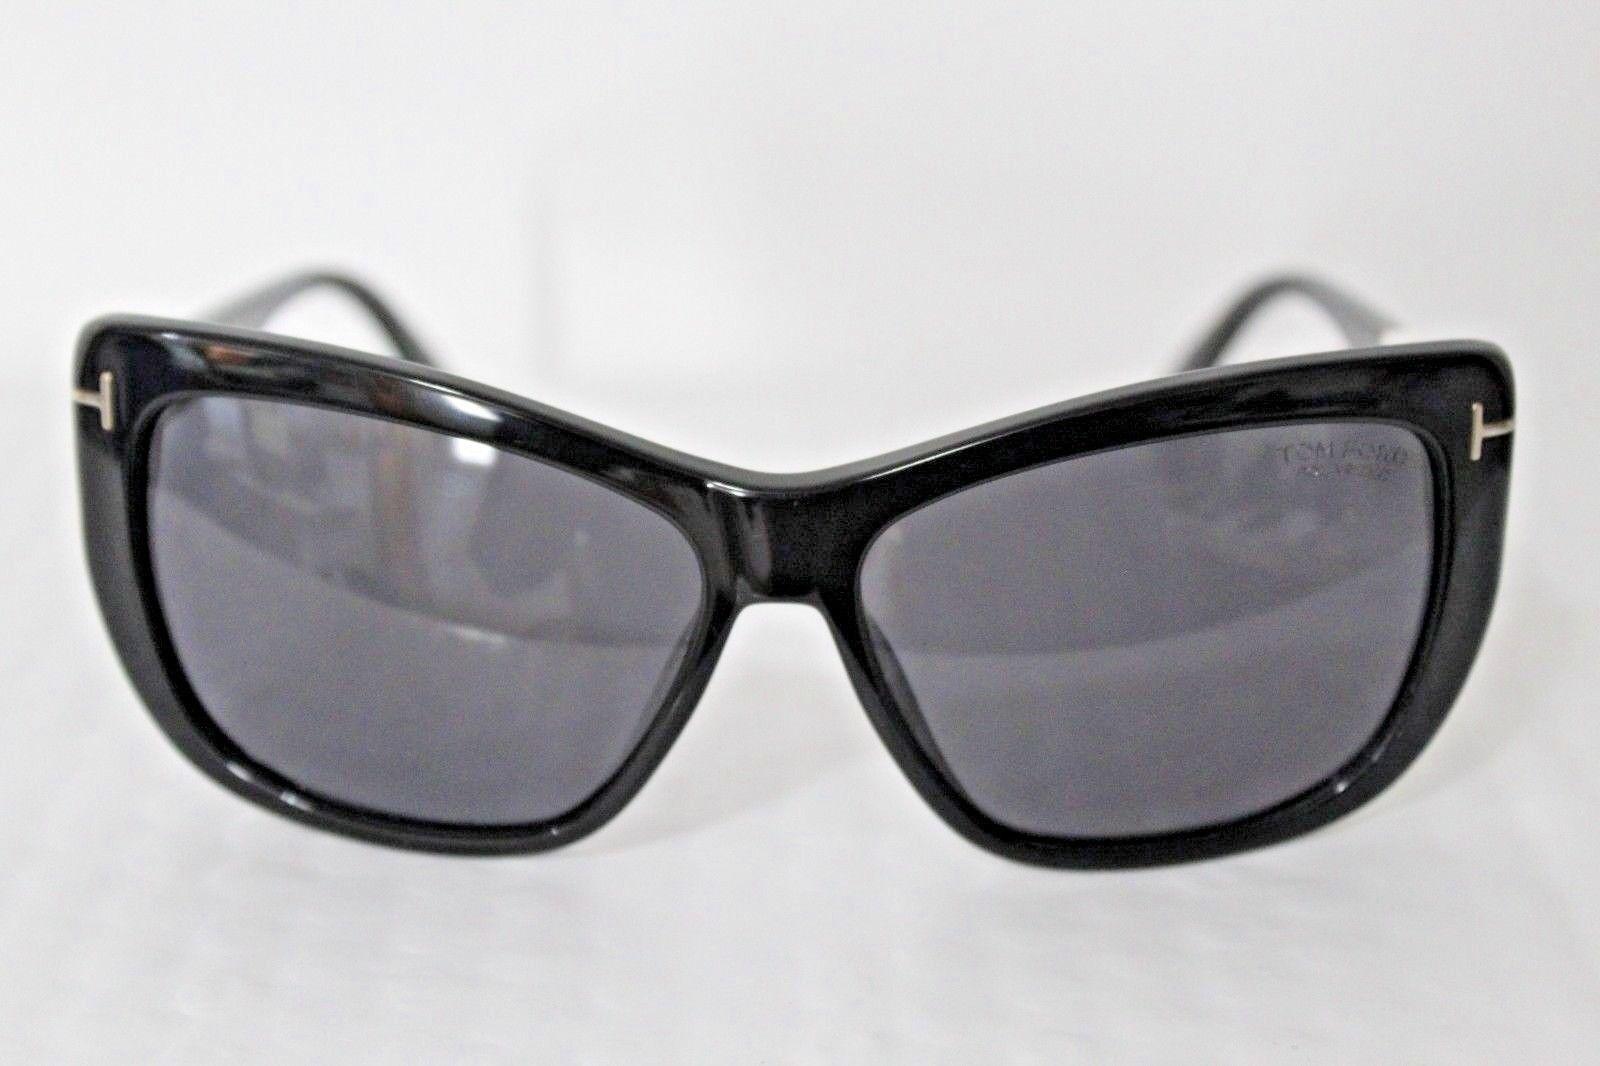 ca419682fd Tom Ford Lindsay TF 434 01d Shiny Black Cat-eye Sunglasses ( )